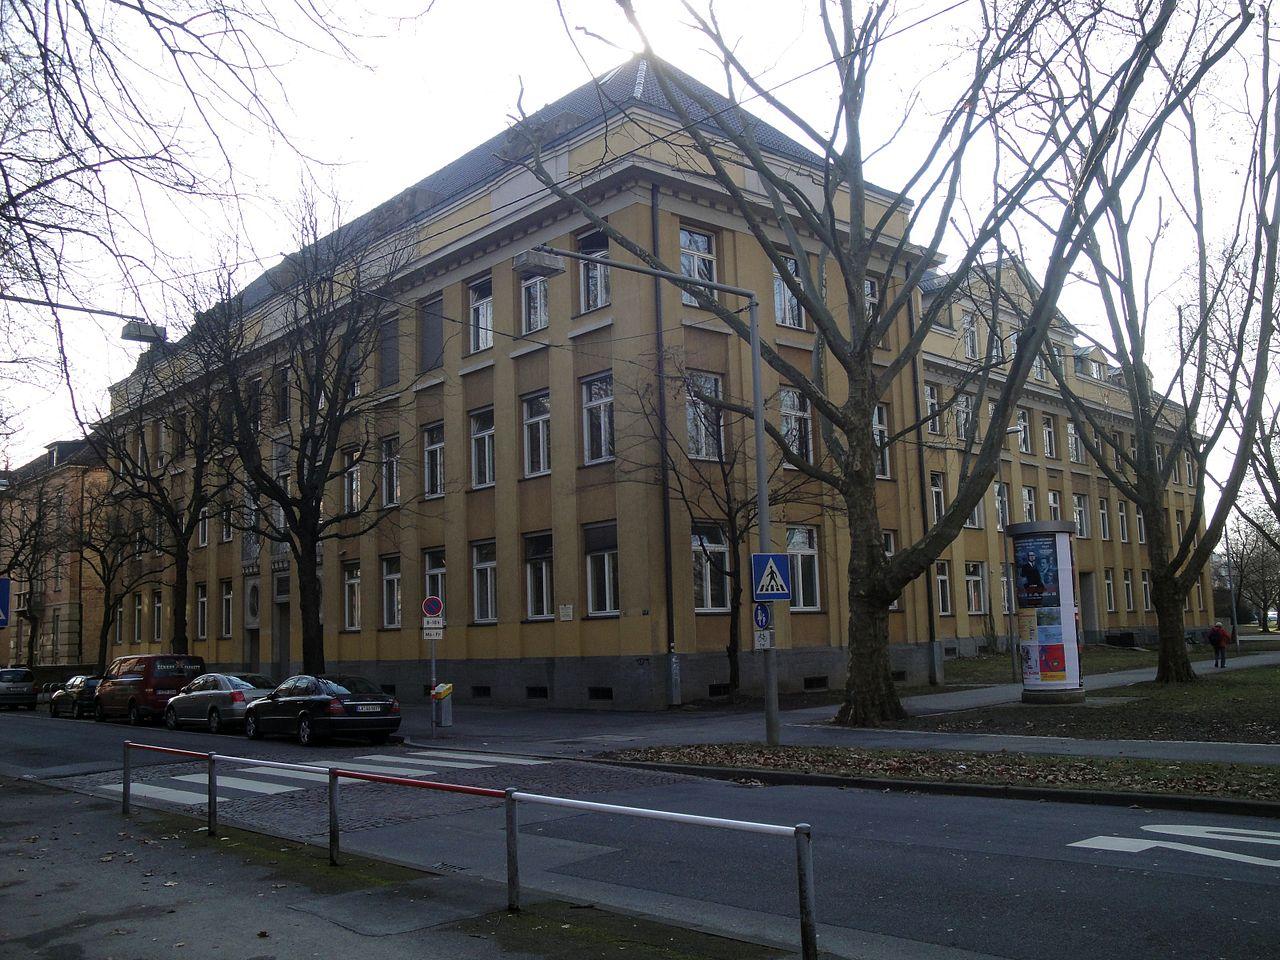 Bild Johannes Kepler Gymnasium Stuttgart Bad Cannstatt